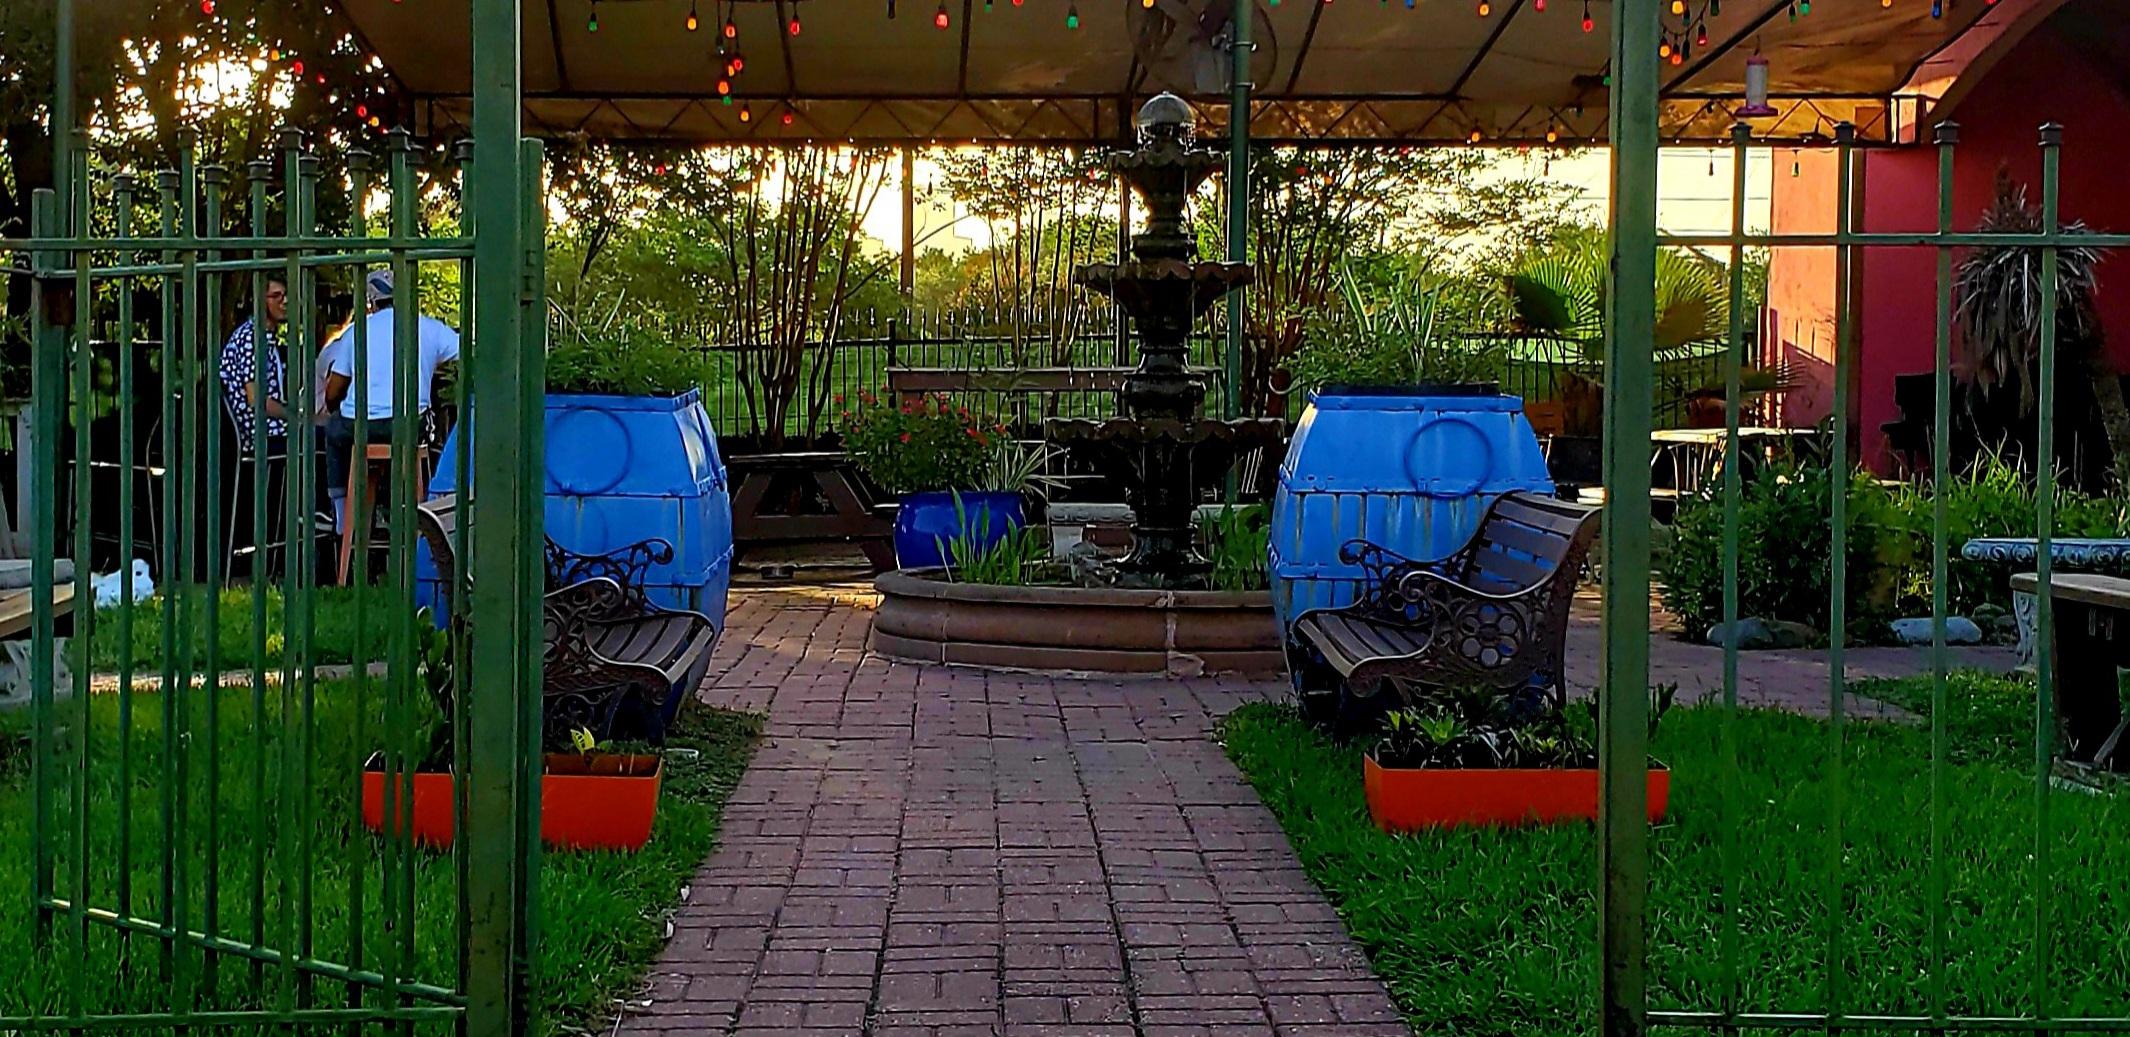 Bohemo's patio